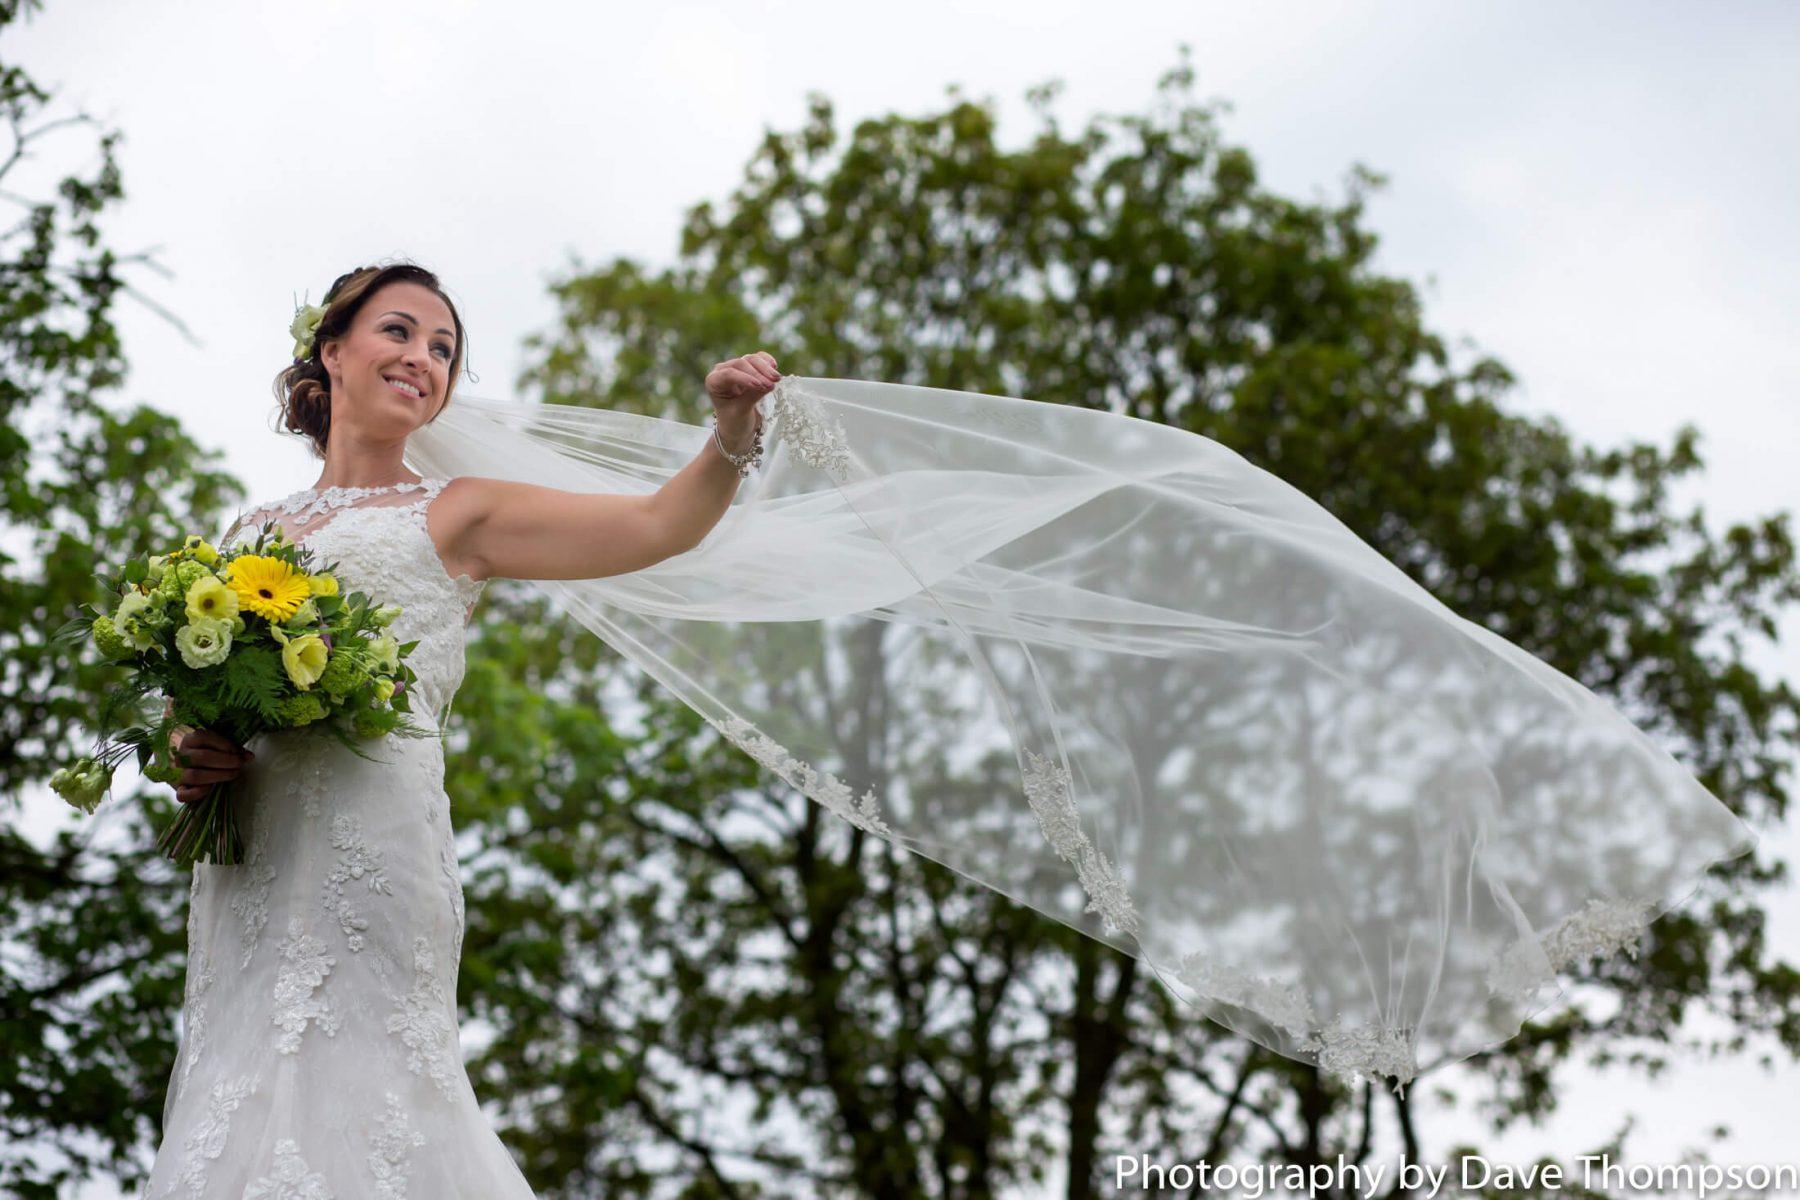 A bride waves her veil